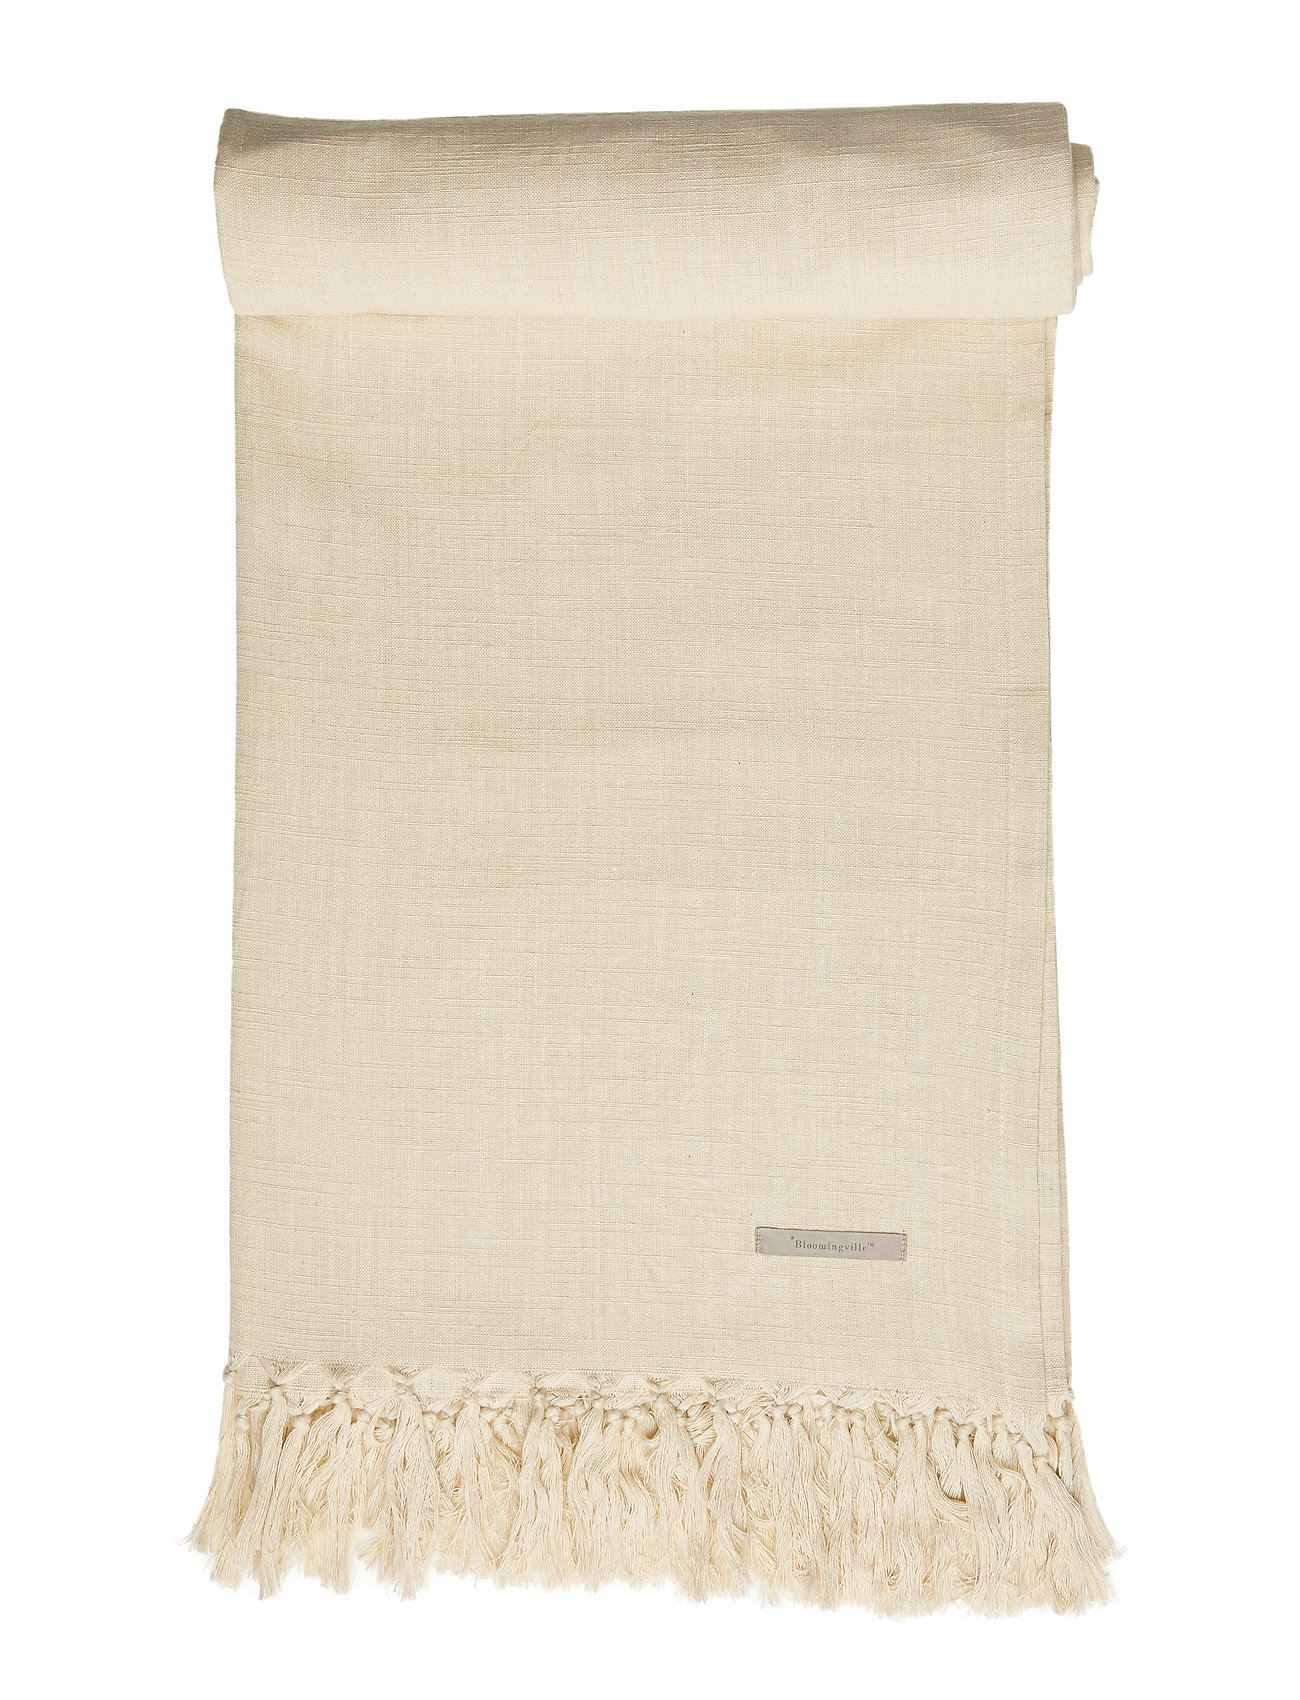 Bloomingville Table Cloth, Nature, Cotton Kök